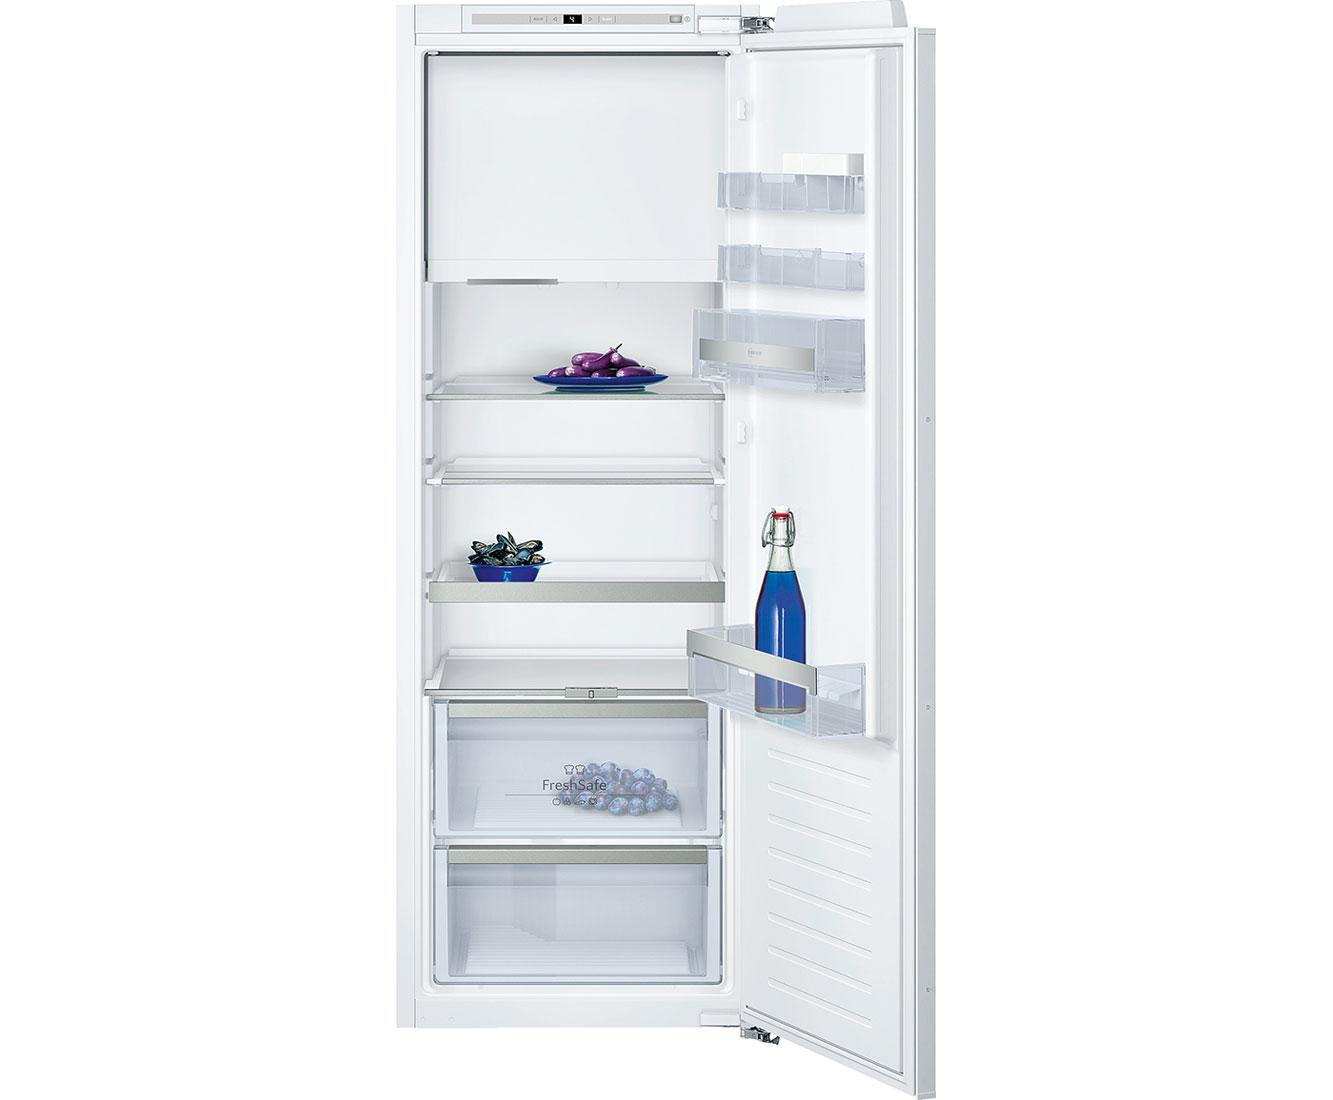 Rabatt-Preisvergleich.de - Haushalt > Kühlschränke ...